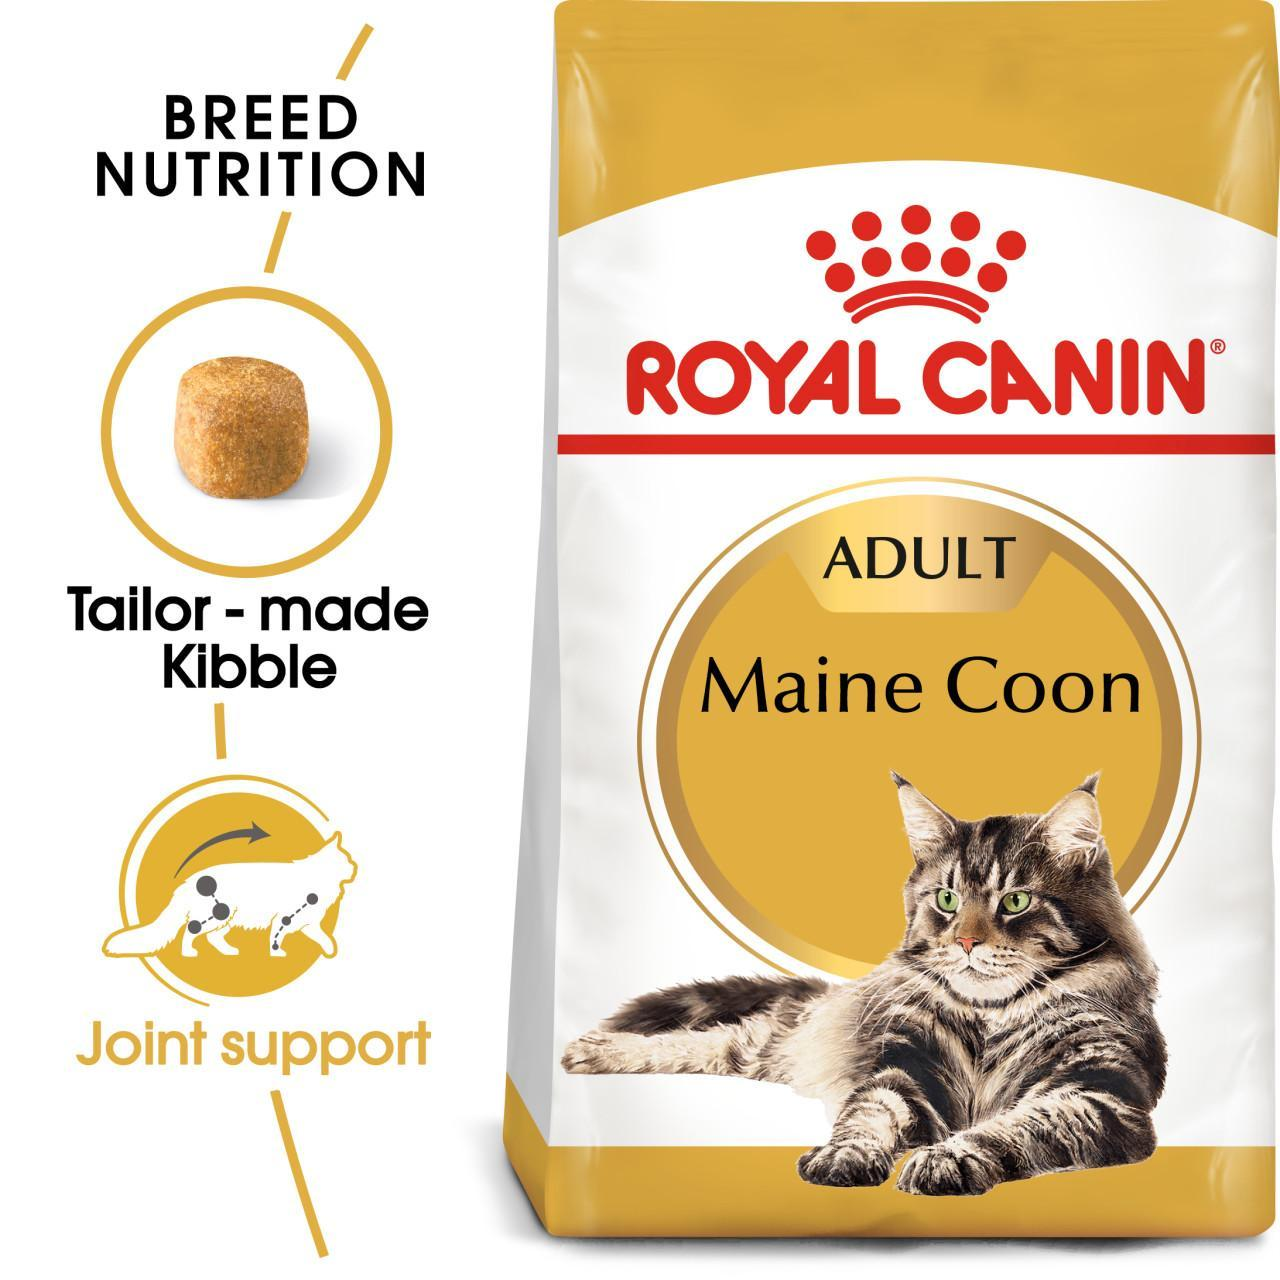 An image of Royal Canin Feline Maine Coon